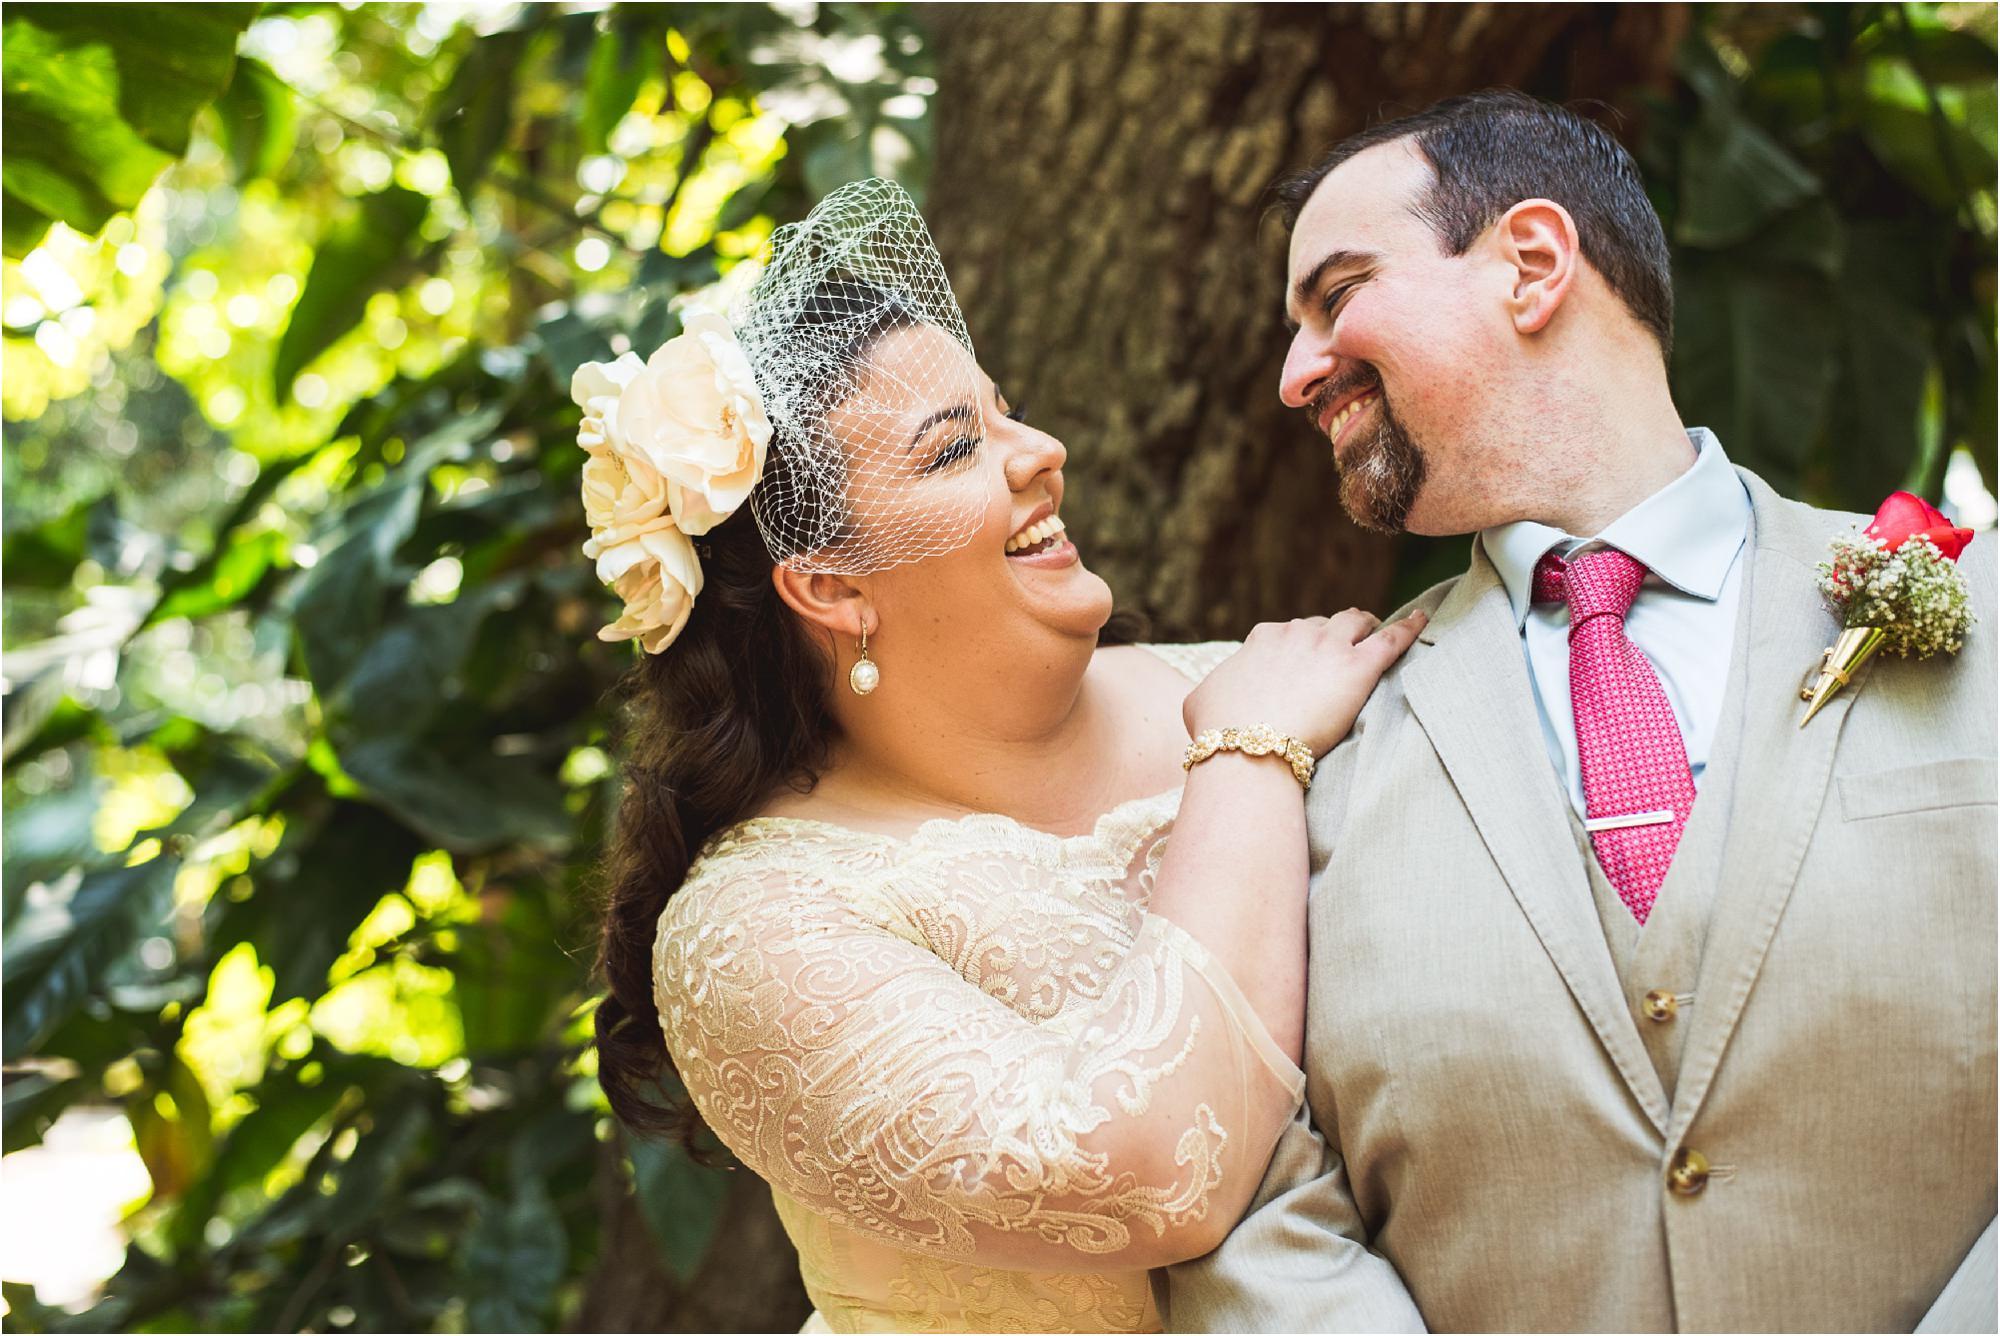 outdoor-rustic-pincrest-gardens-wedding-miami-photographer-jessenia-gonzalez_1011.jpg